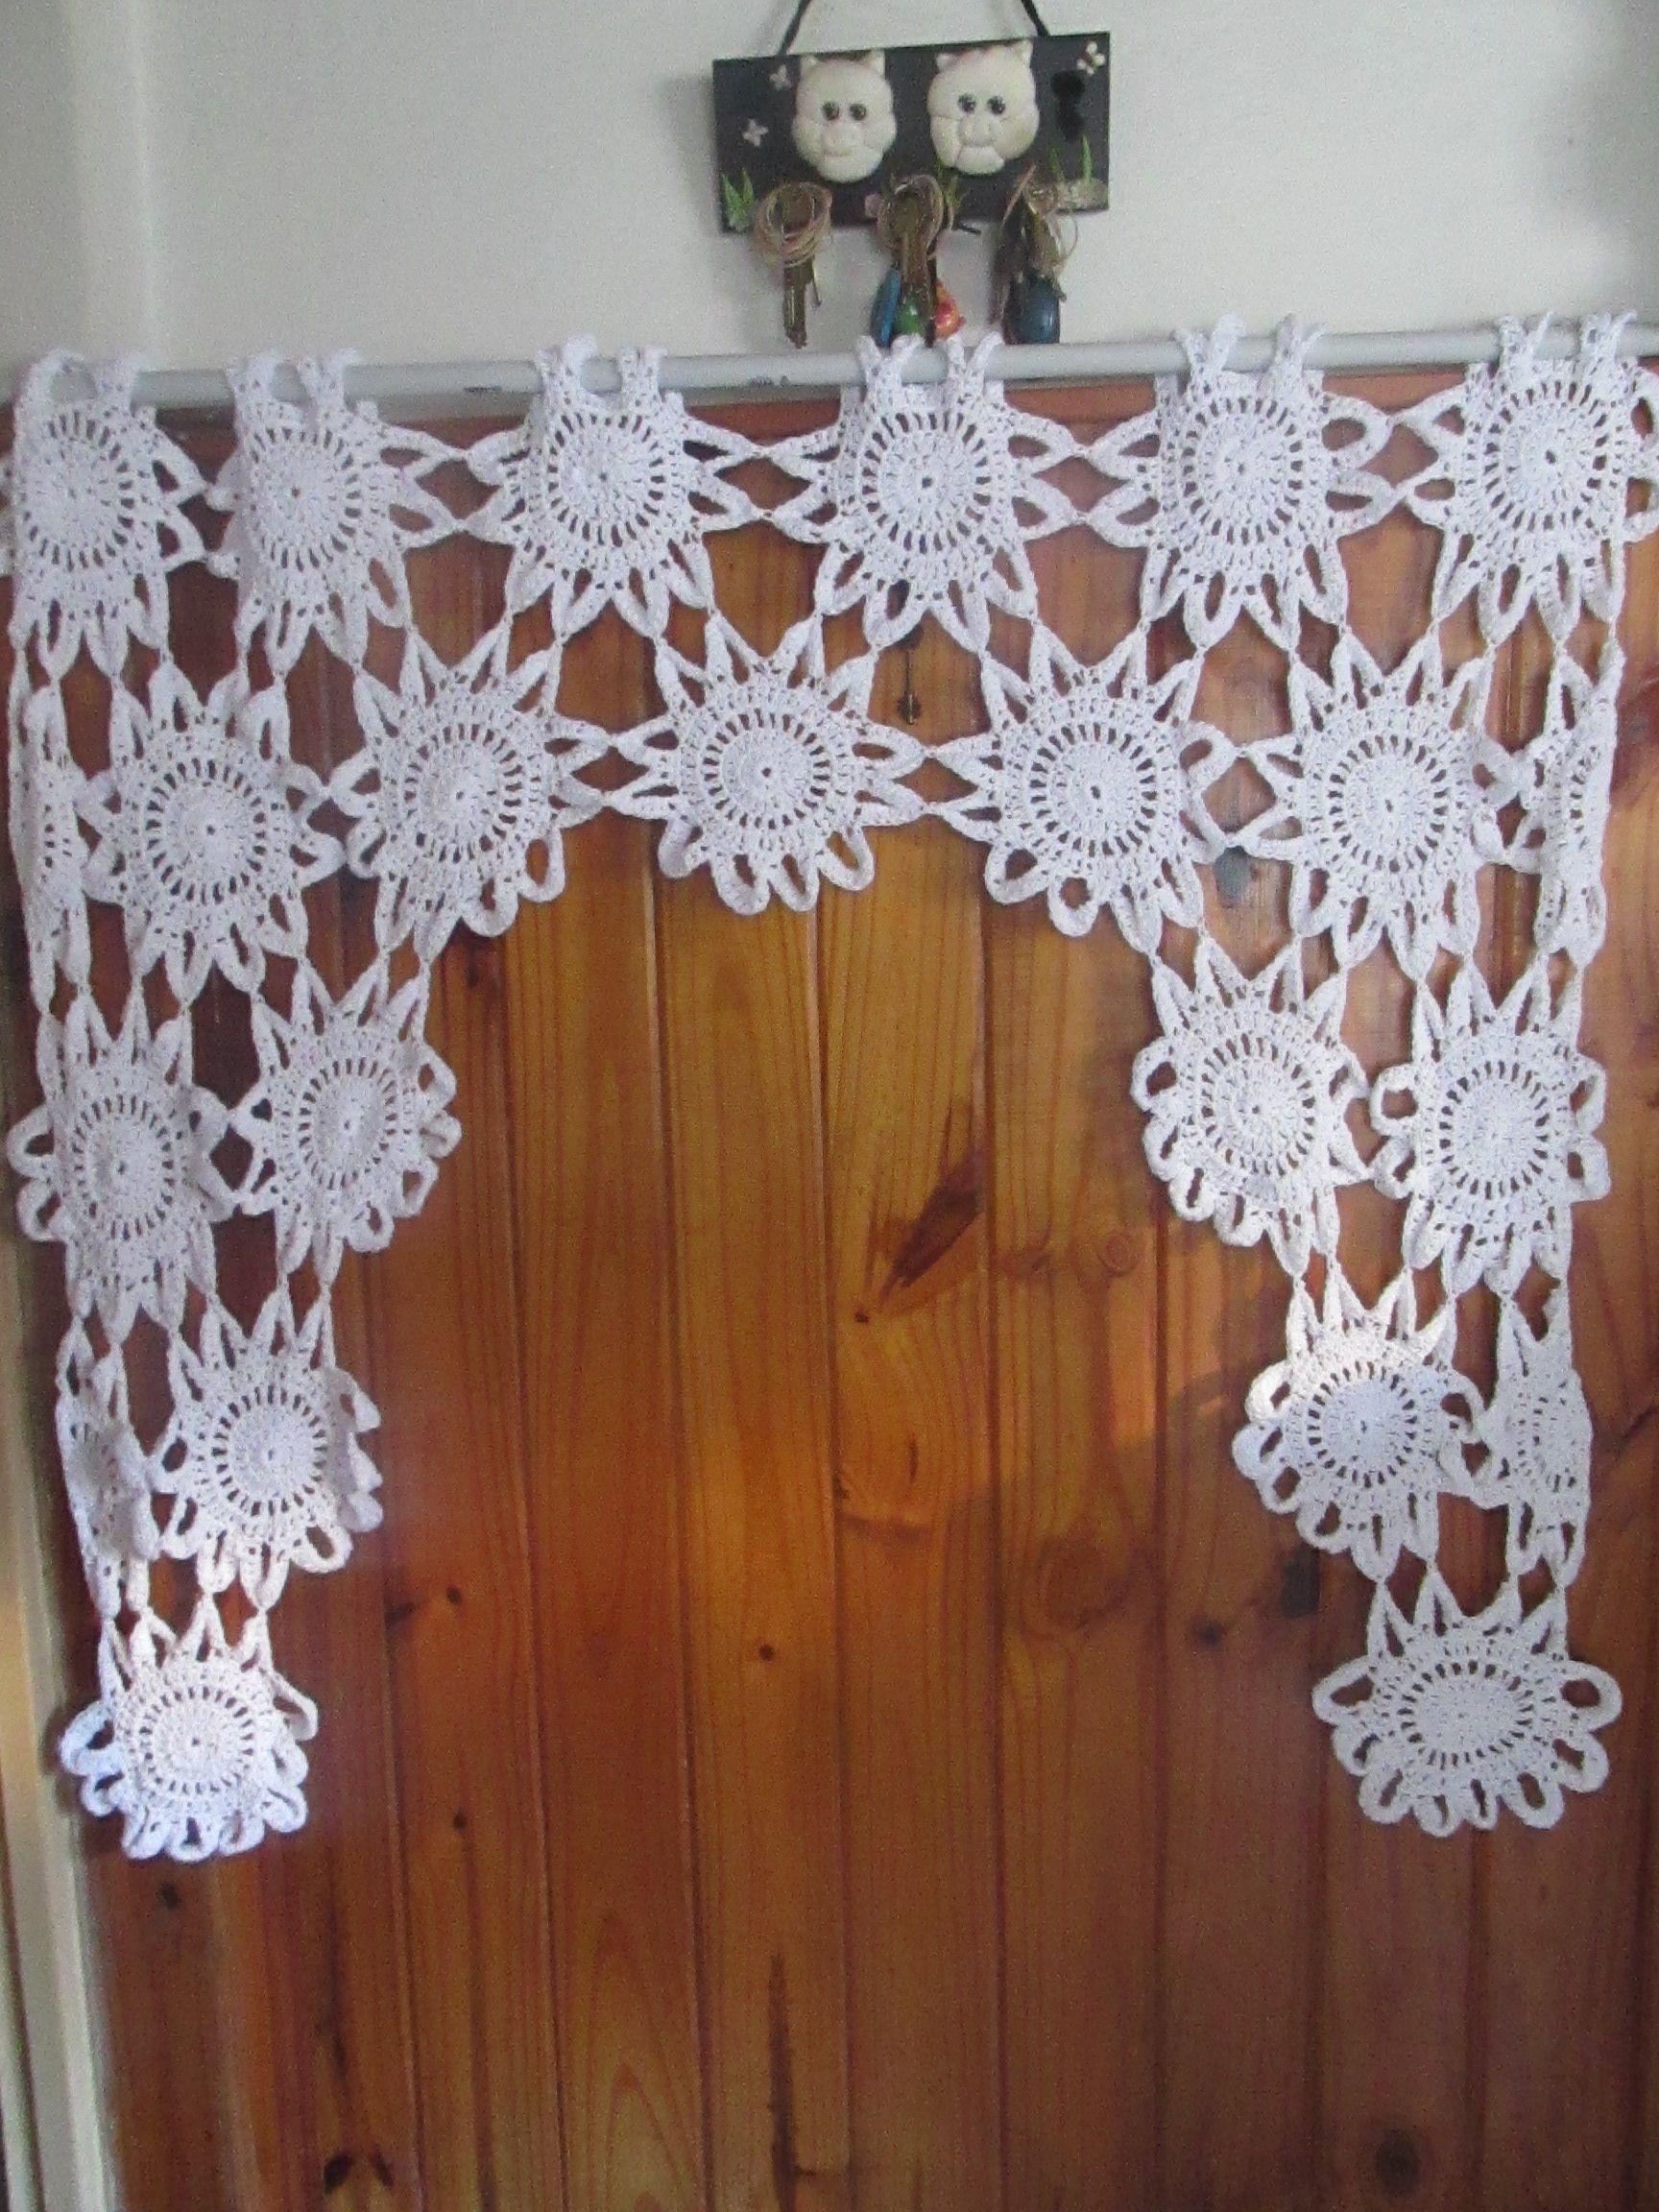 Cortina de flores blancas al crochet  Cortina Tejida  Pinterest  Crochet curtains Crochet and Crochet kitchen